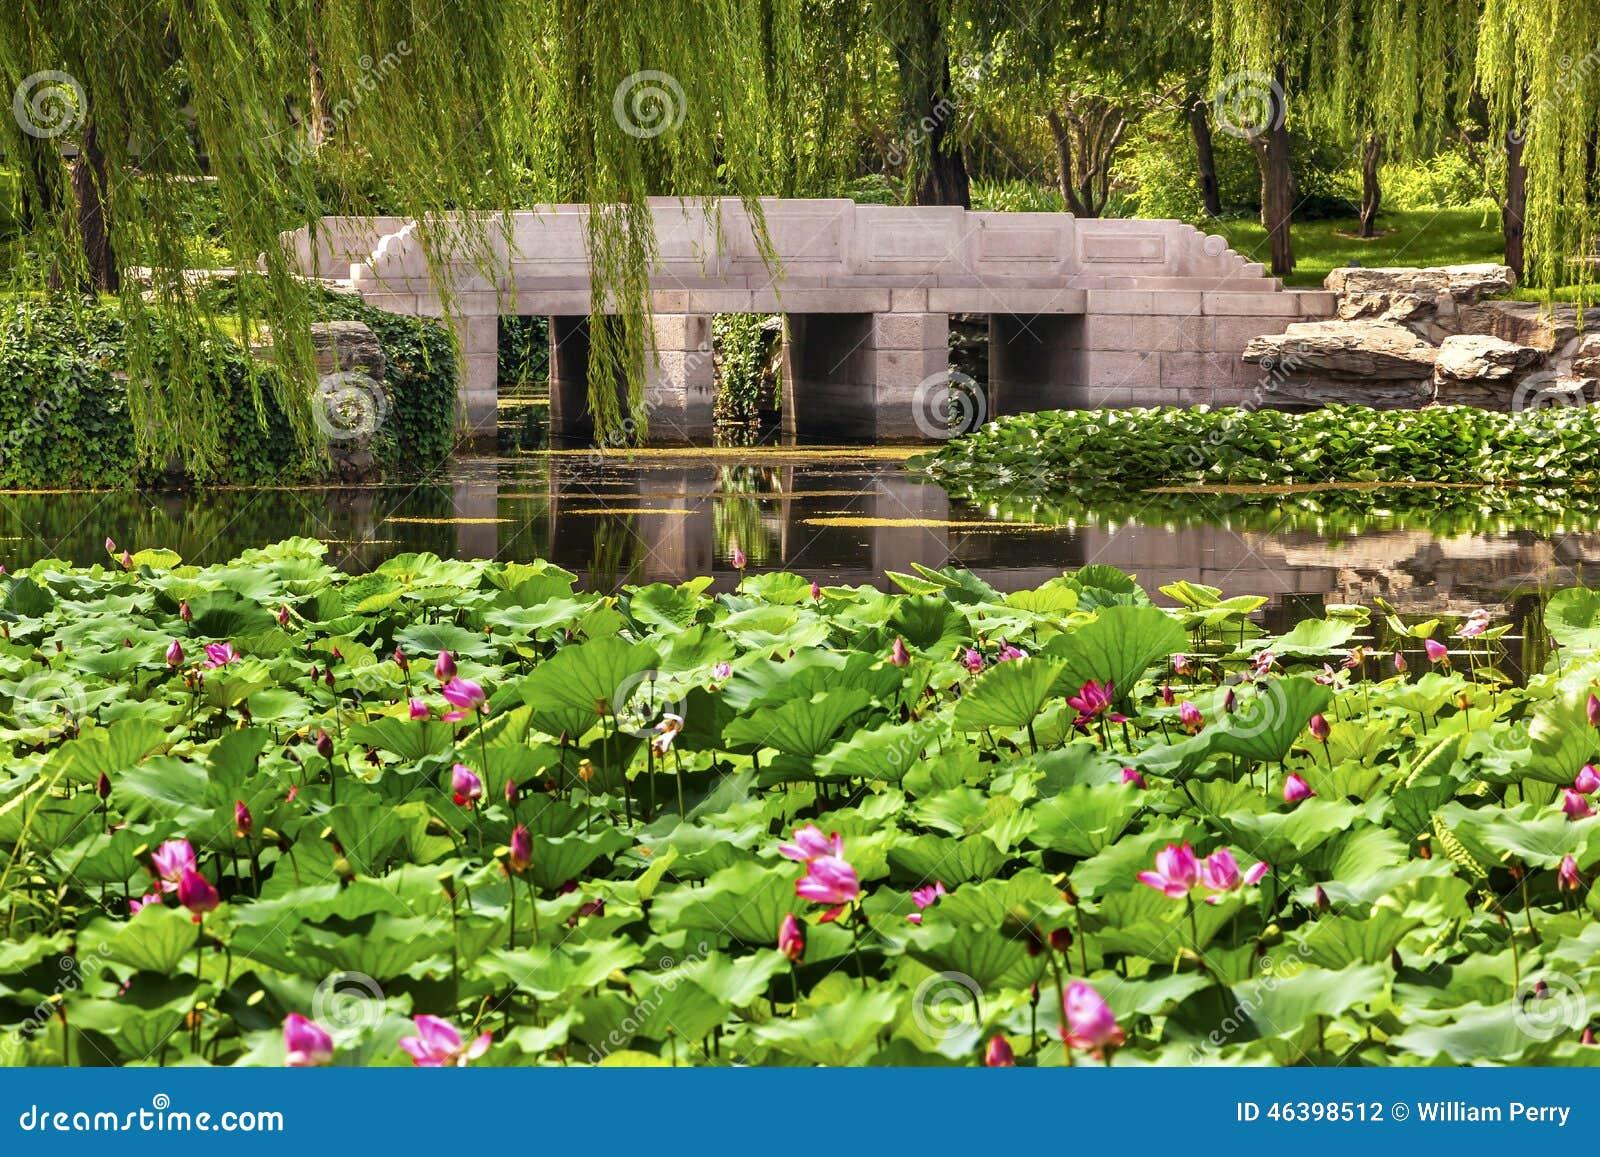 Lotus garden chinese garden ftempo for Western state bank garden city